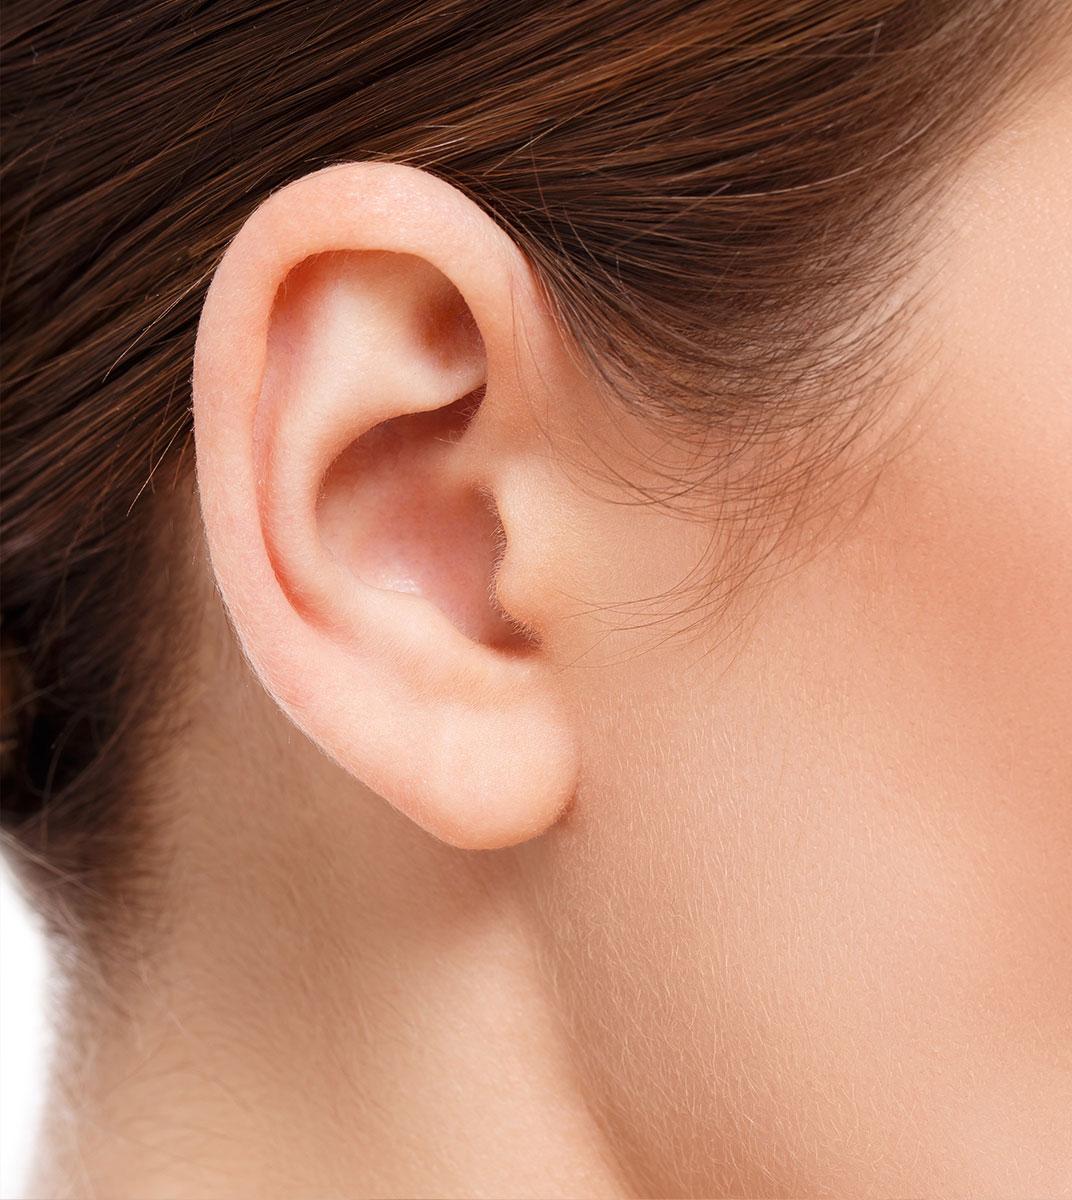 Earfold Ohren anlegen